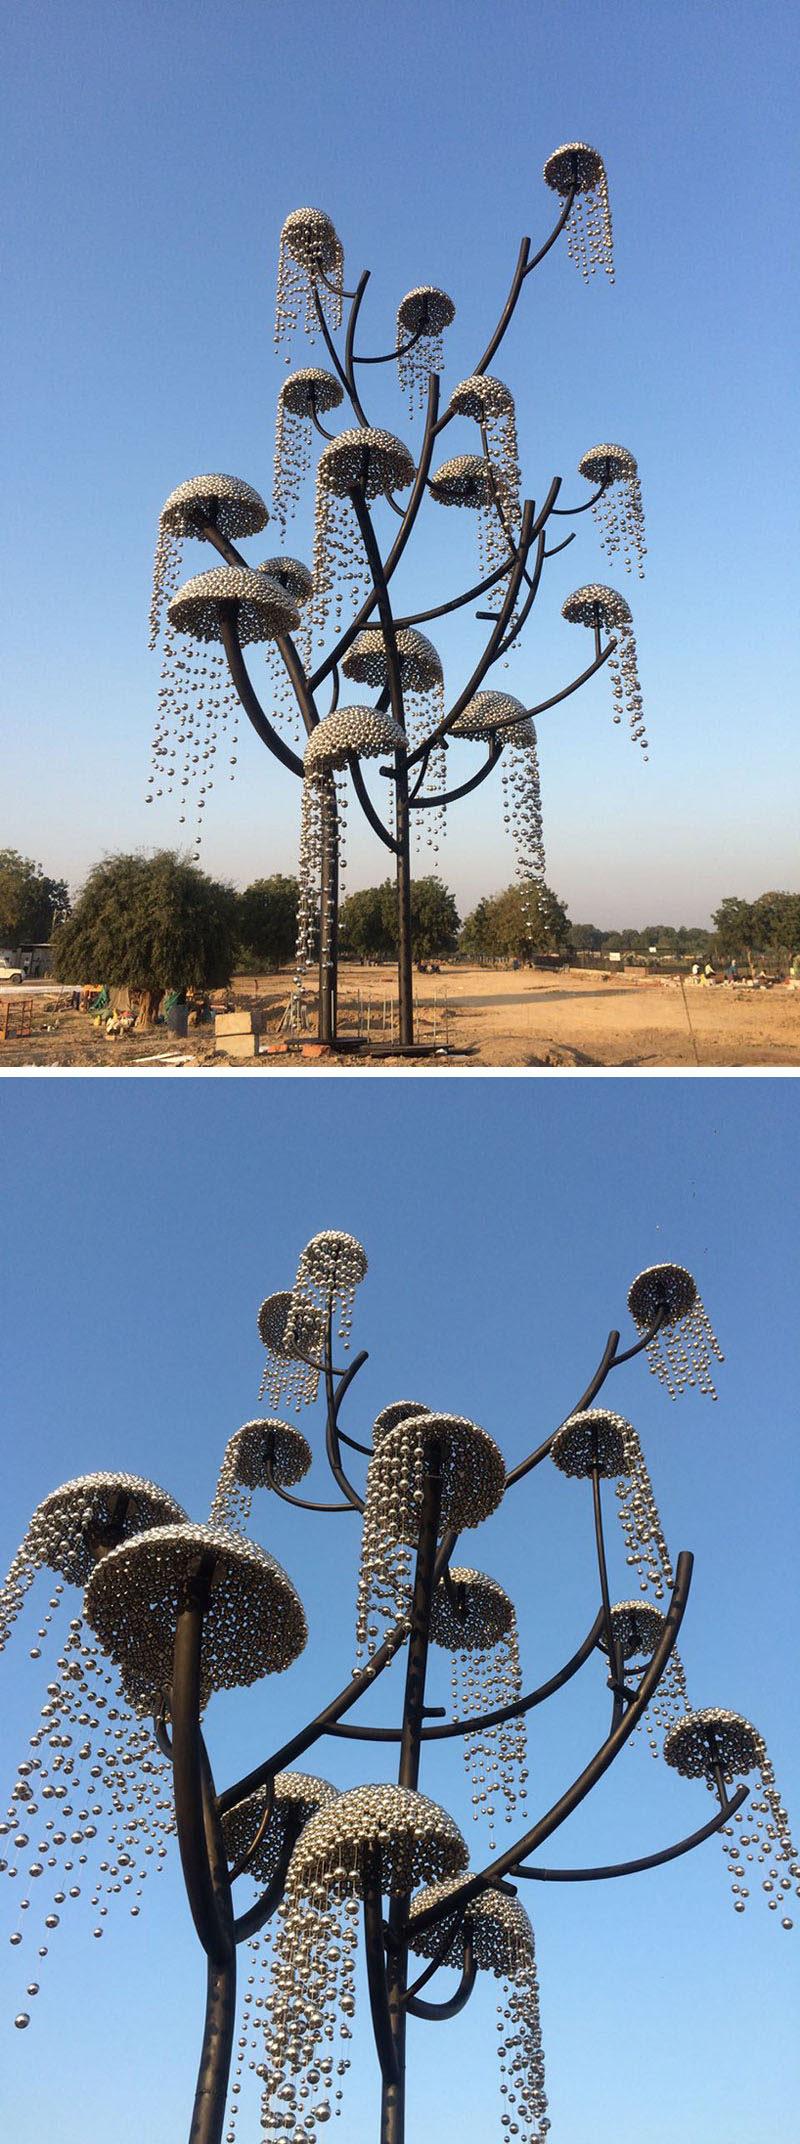 "Indian designer and artist Vibhor Sogani has designed a modern stainless steel sculpture named ""Kalpavriksha - the wish fulfilling tree"". #Sculpture #Art #PublicArt"